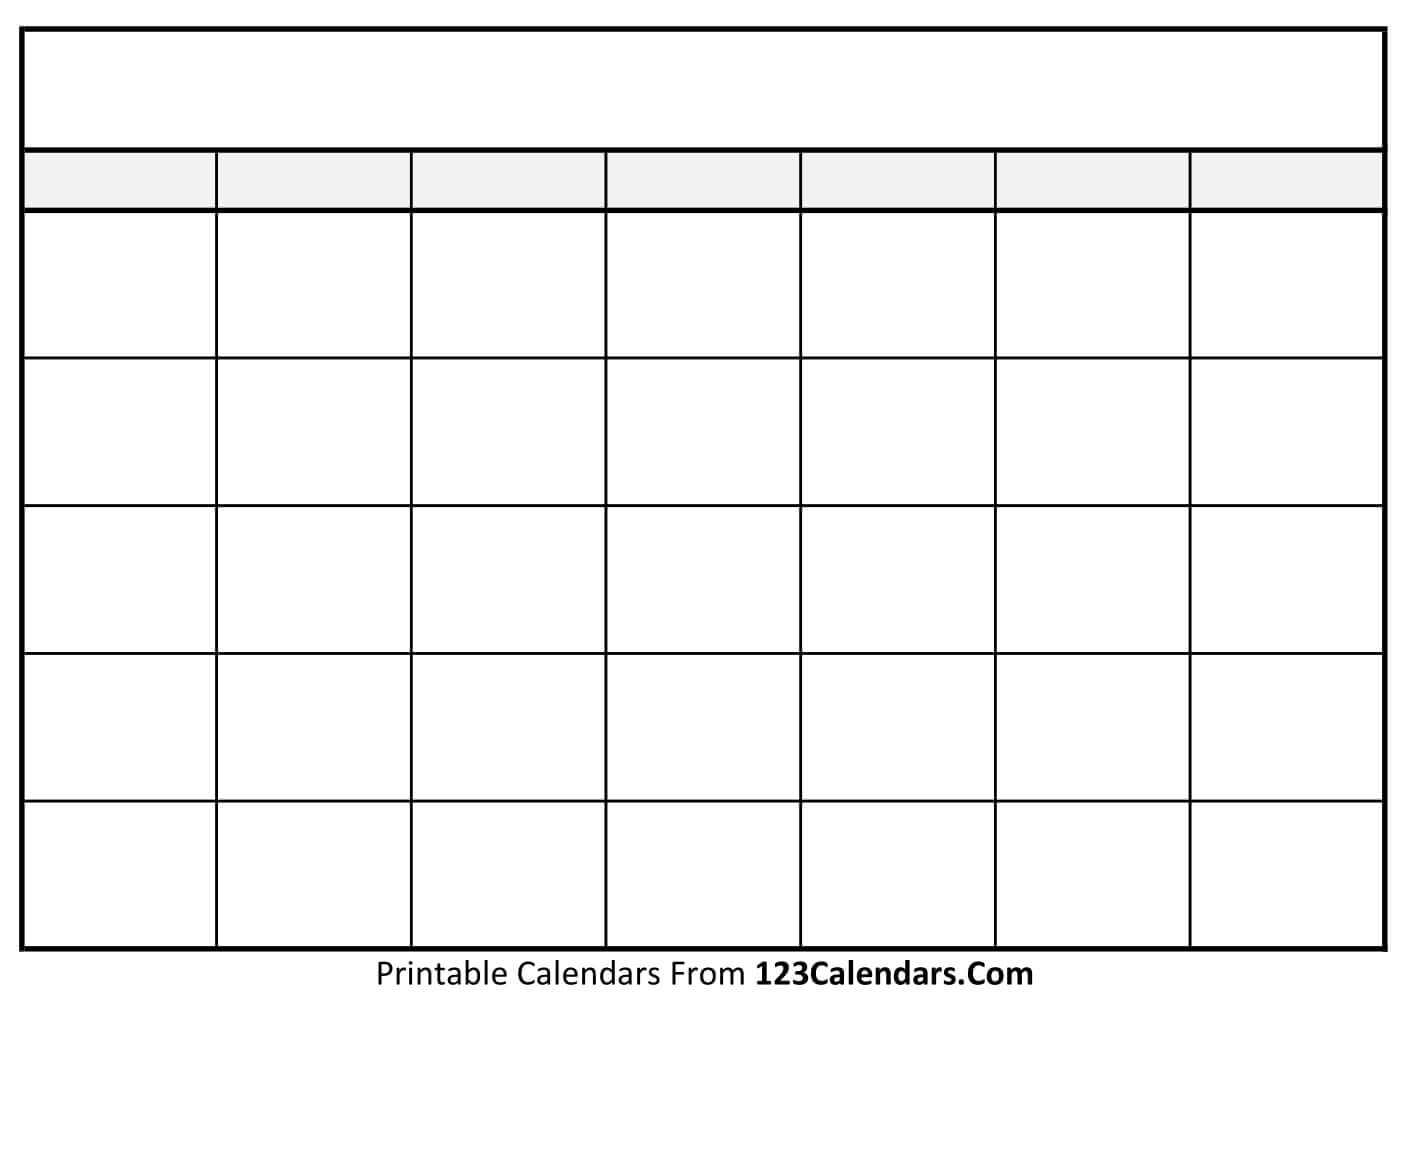 printable blank calendar templates 123calendars com